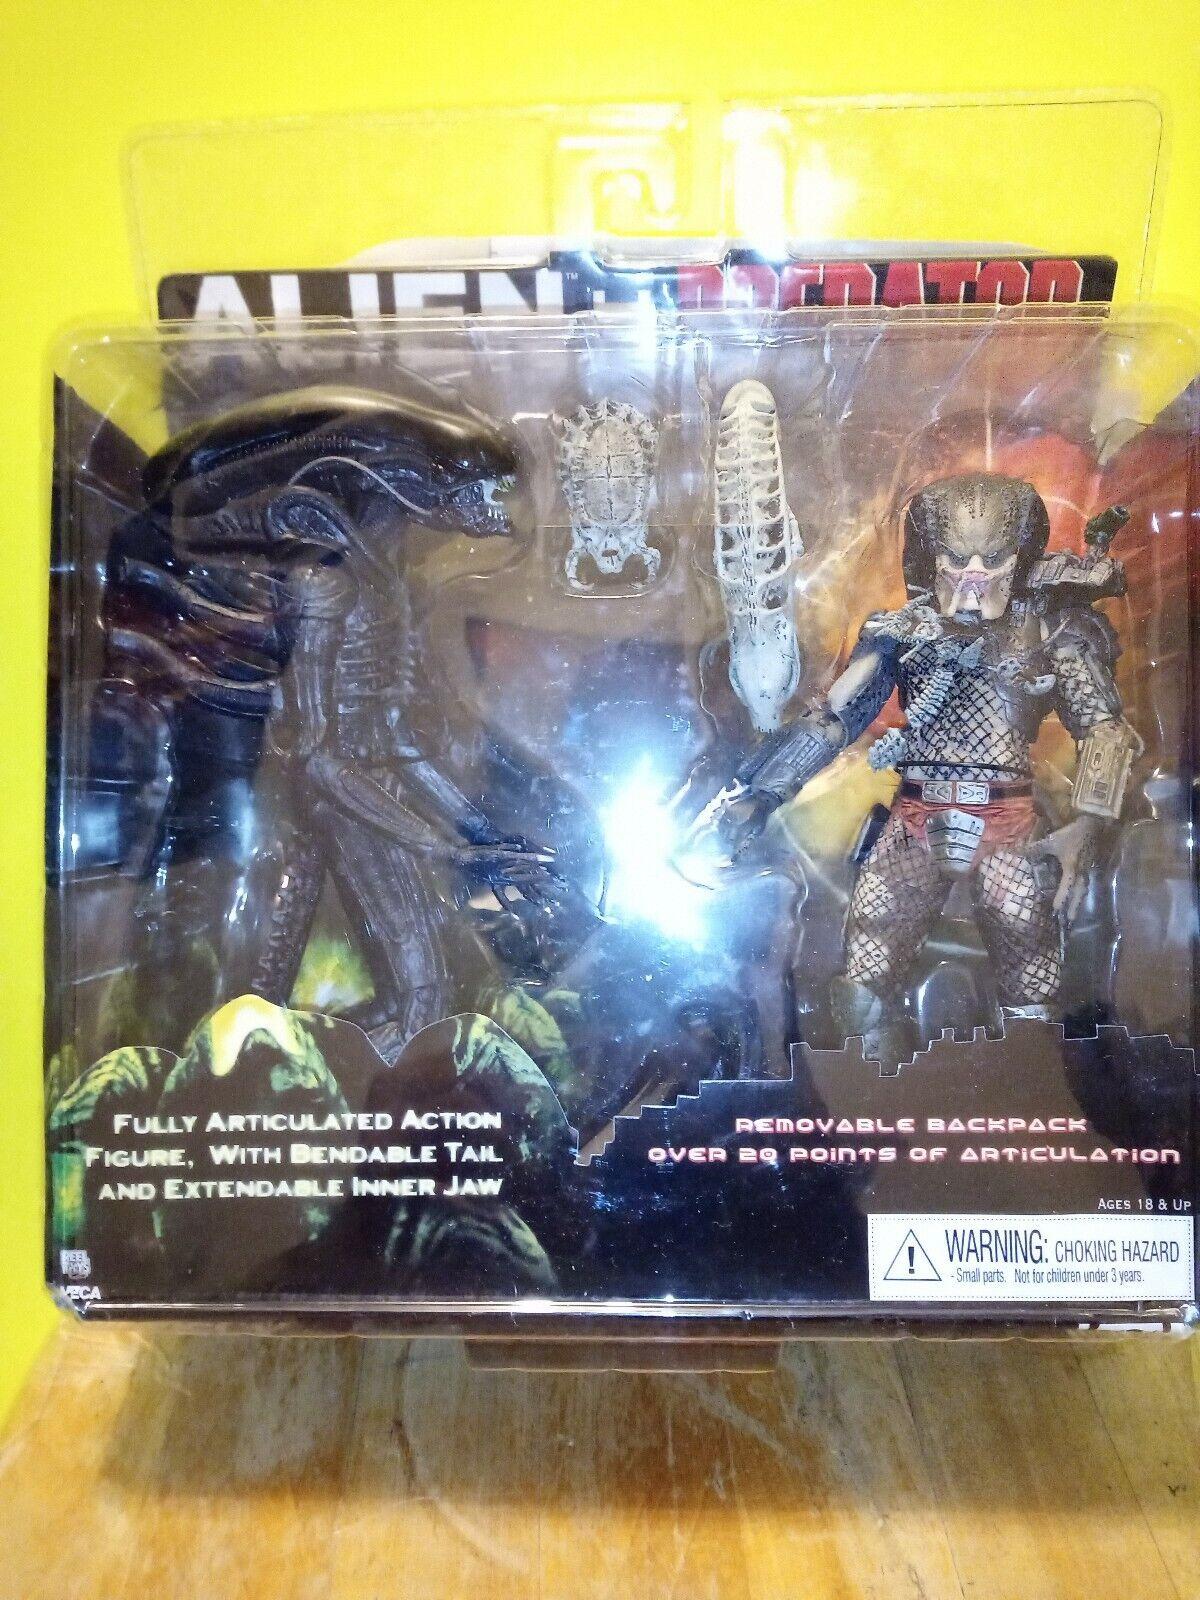 NECA Alien vs Protator Toys R Us exclusive 2 pack